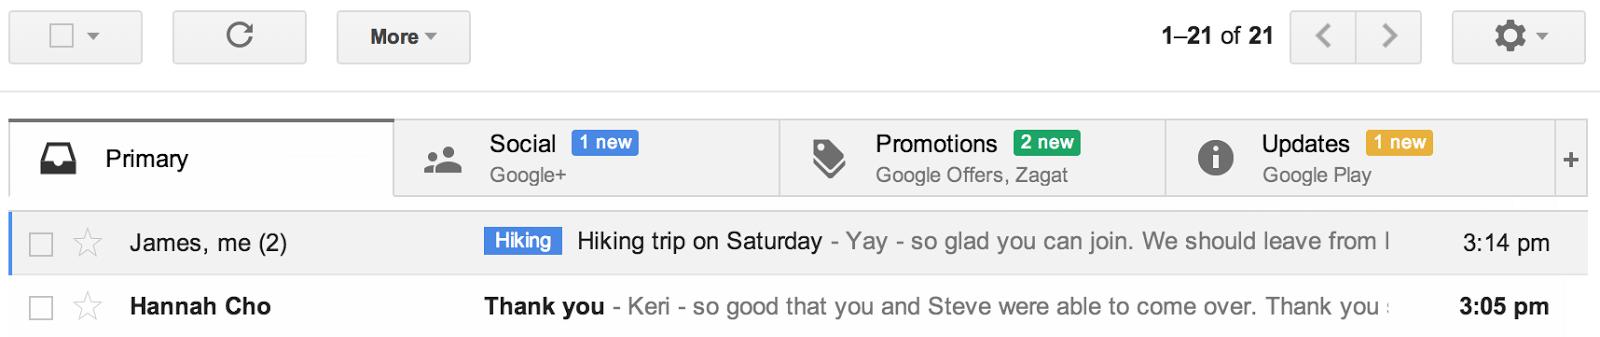 29. Mai 2013: Gmail erhält Tabs...